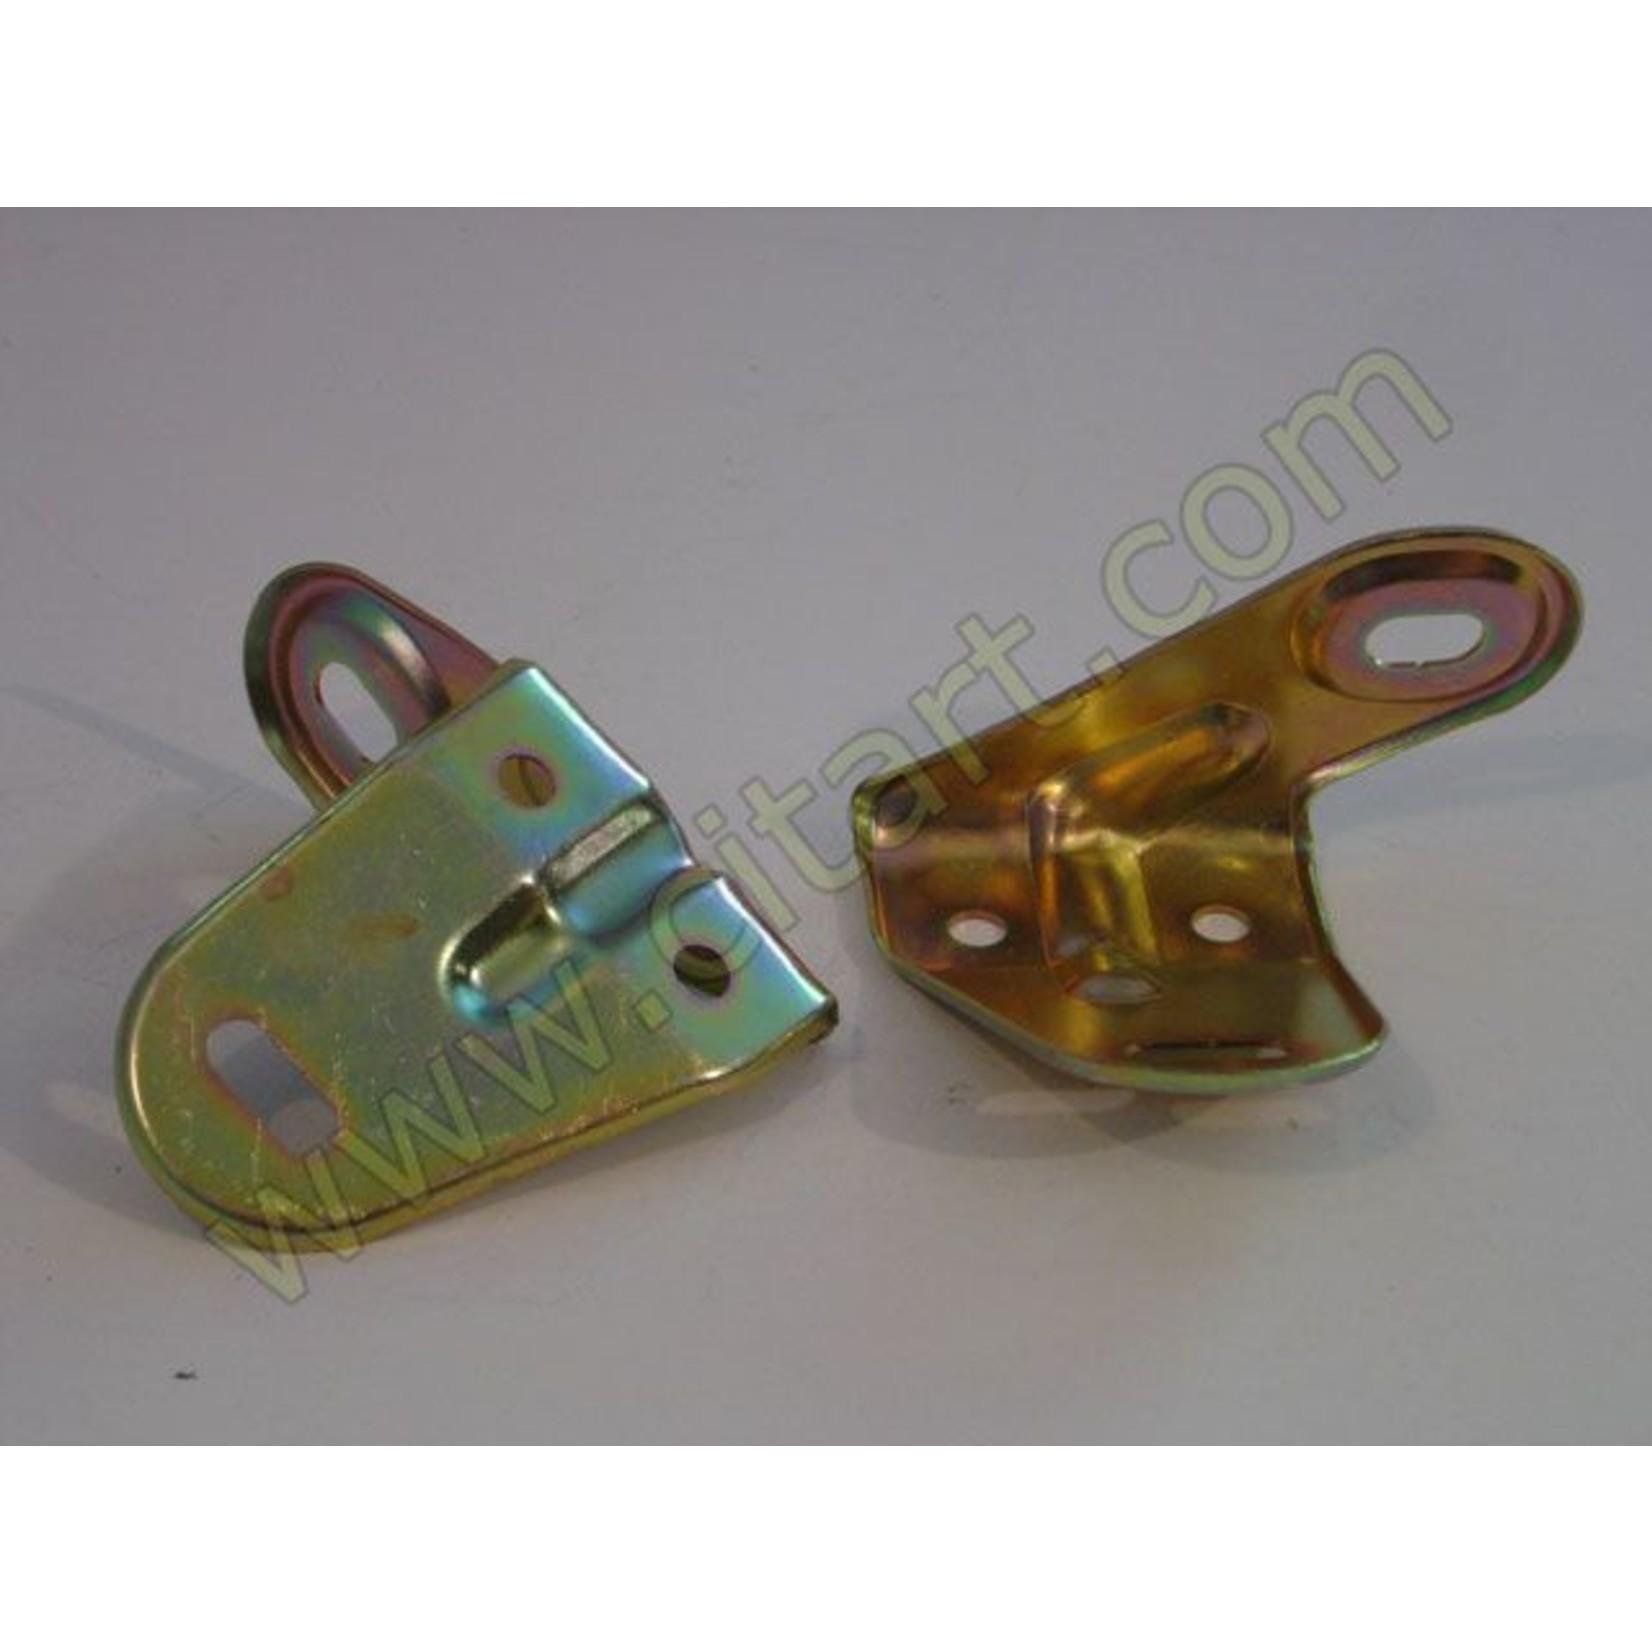 Linker hoek bumper - voorscherm RVS 68- Nr Org: DX61556